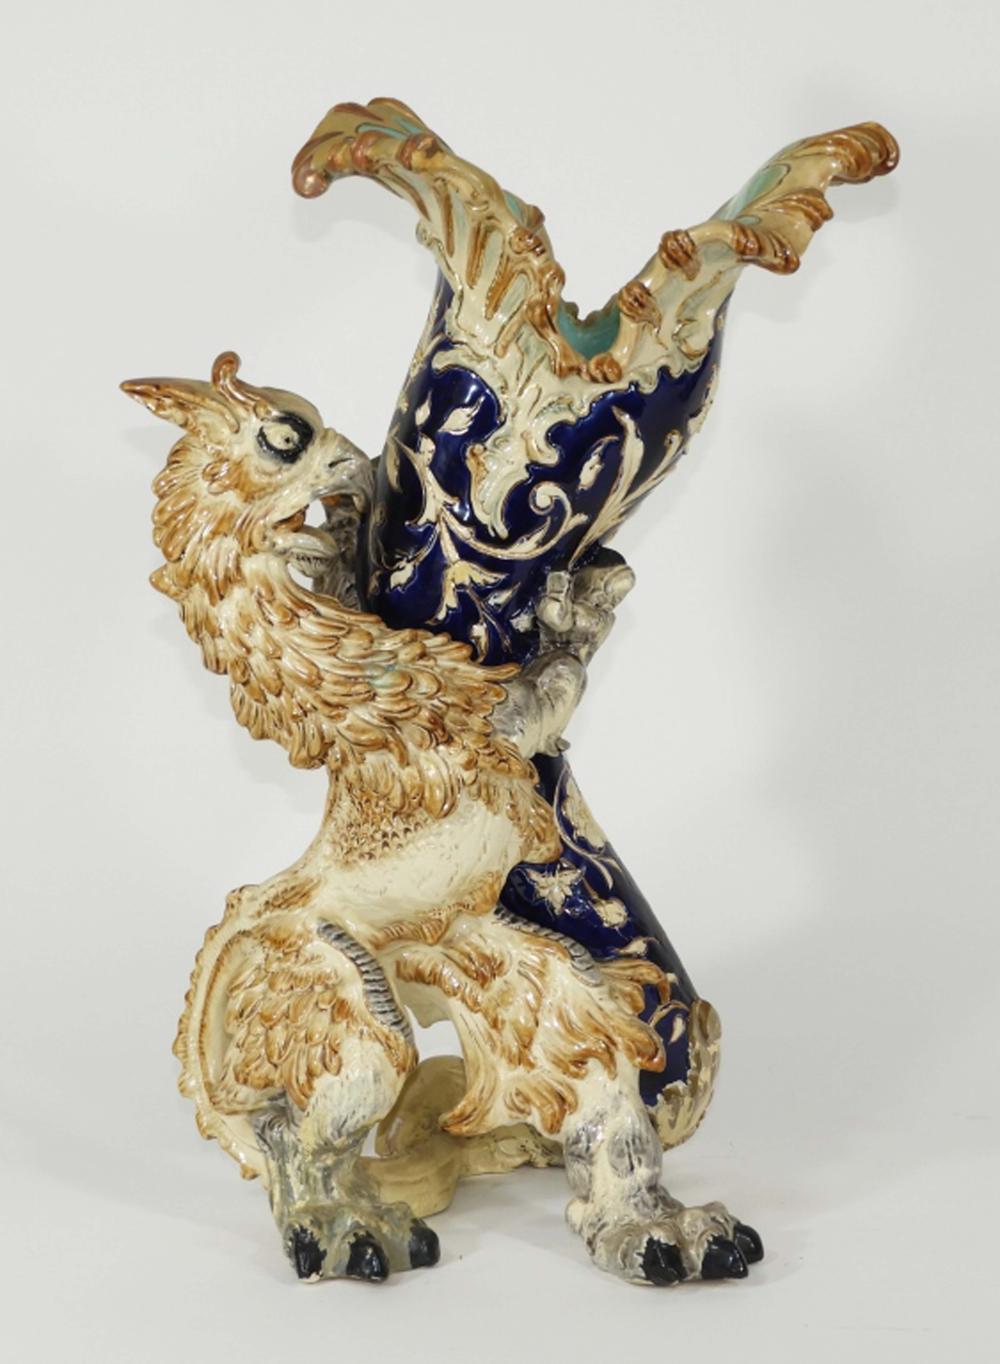 19C English Majolica Figural Griffin Beast Vase